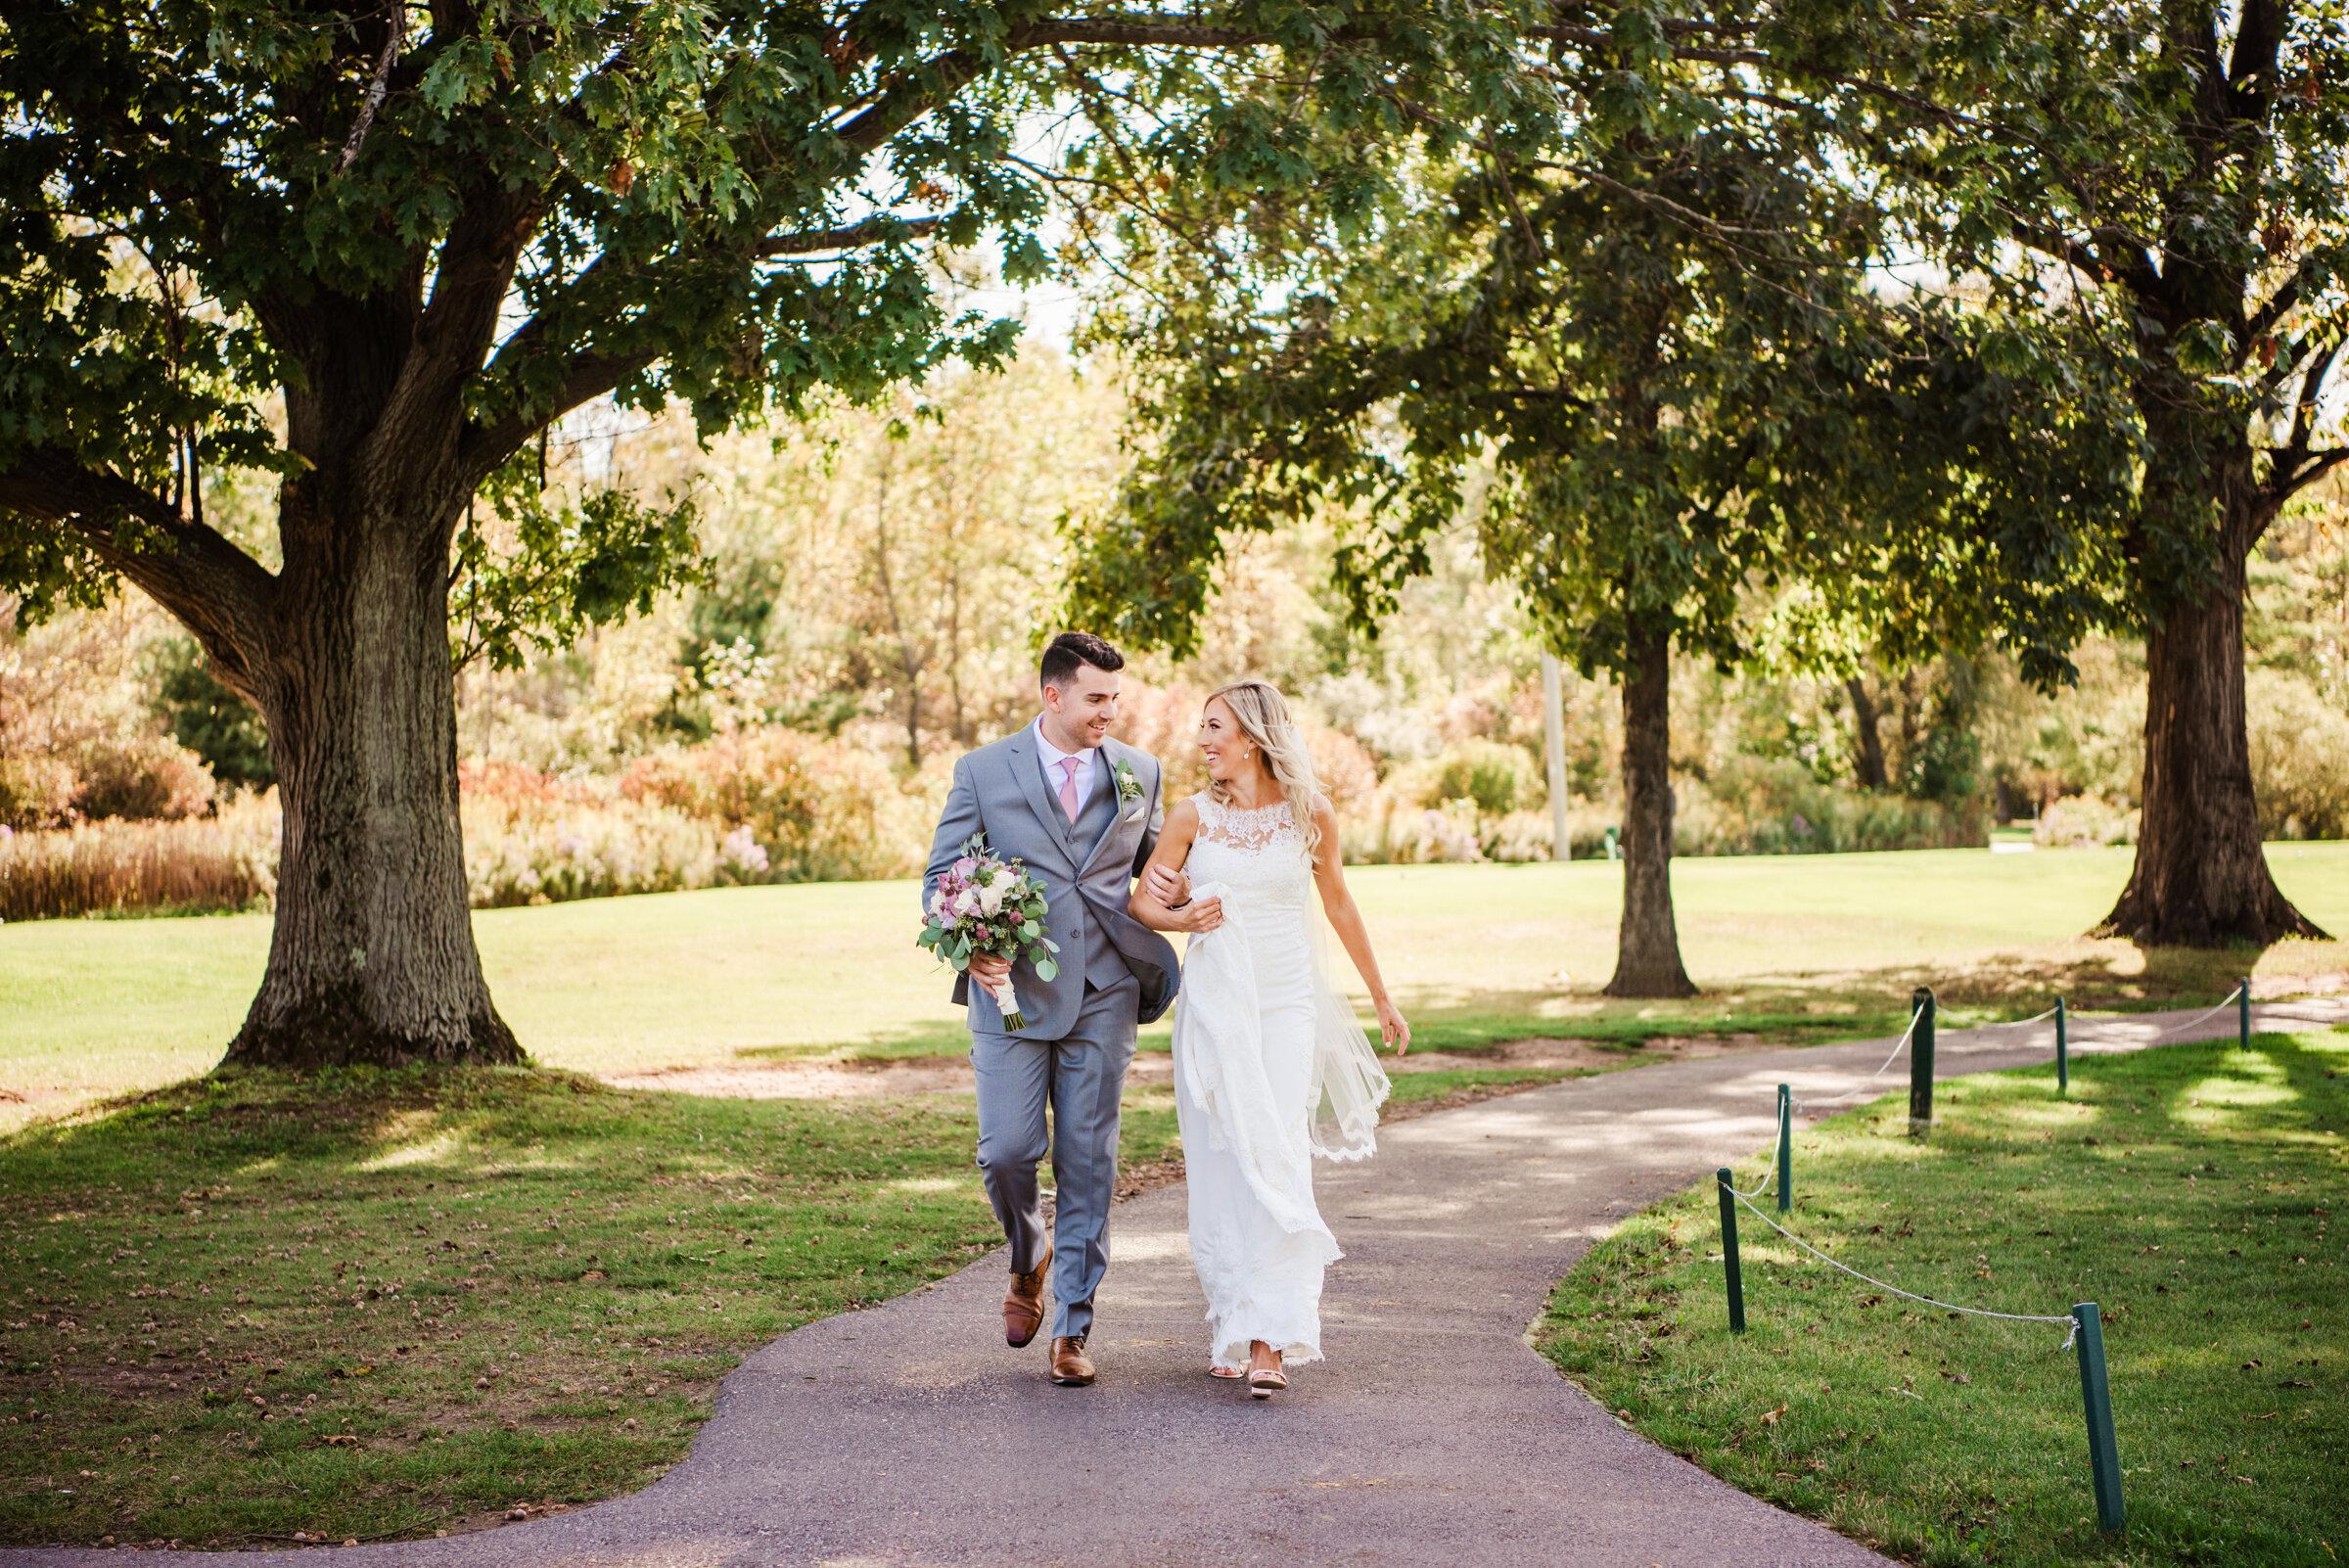 Deerfield_Country_Club_Rochester_Wedding_JILL_STUDIO_Rochester_NY_Photographer_DSC_6459.jpg